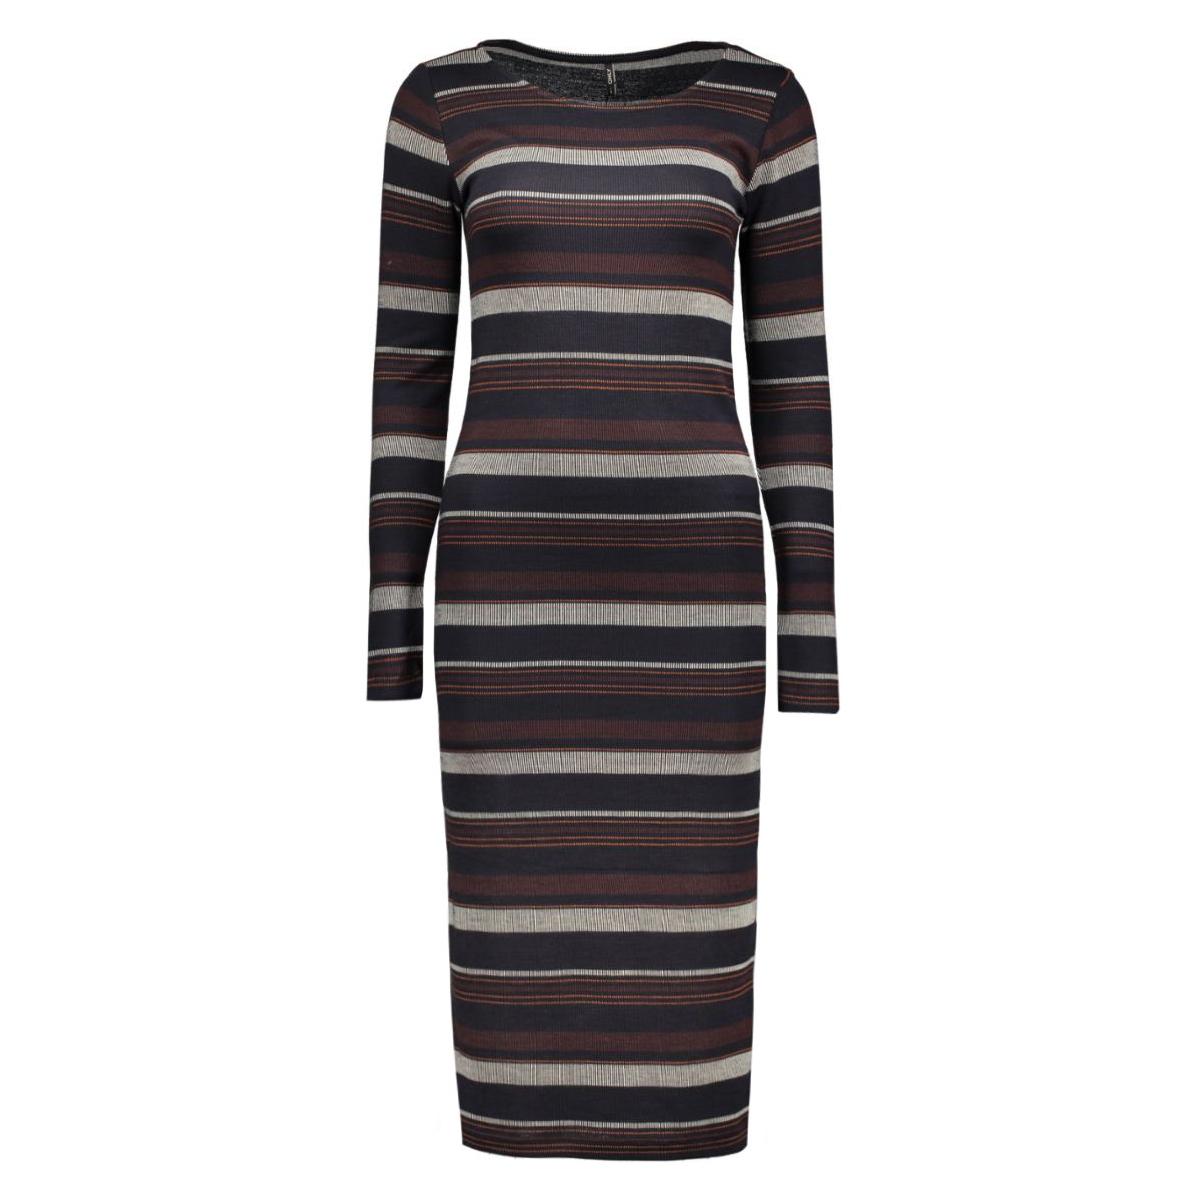 onlnew brooks l/s calf dress ess 15125079 only jurk whitecap gray/worker